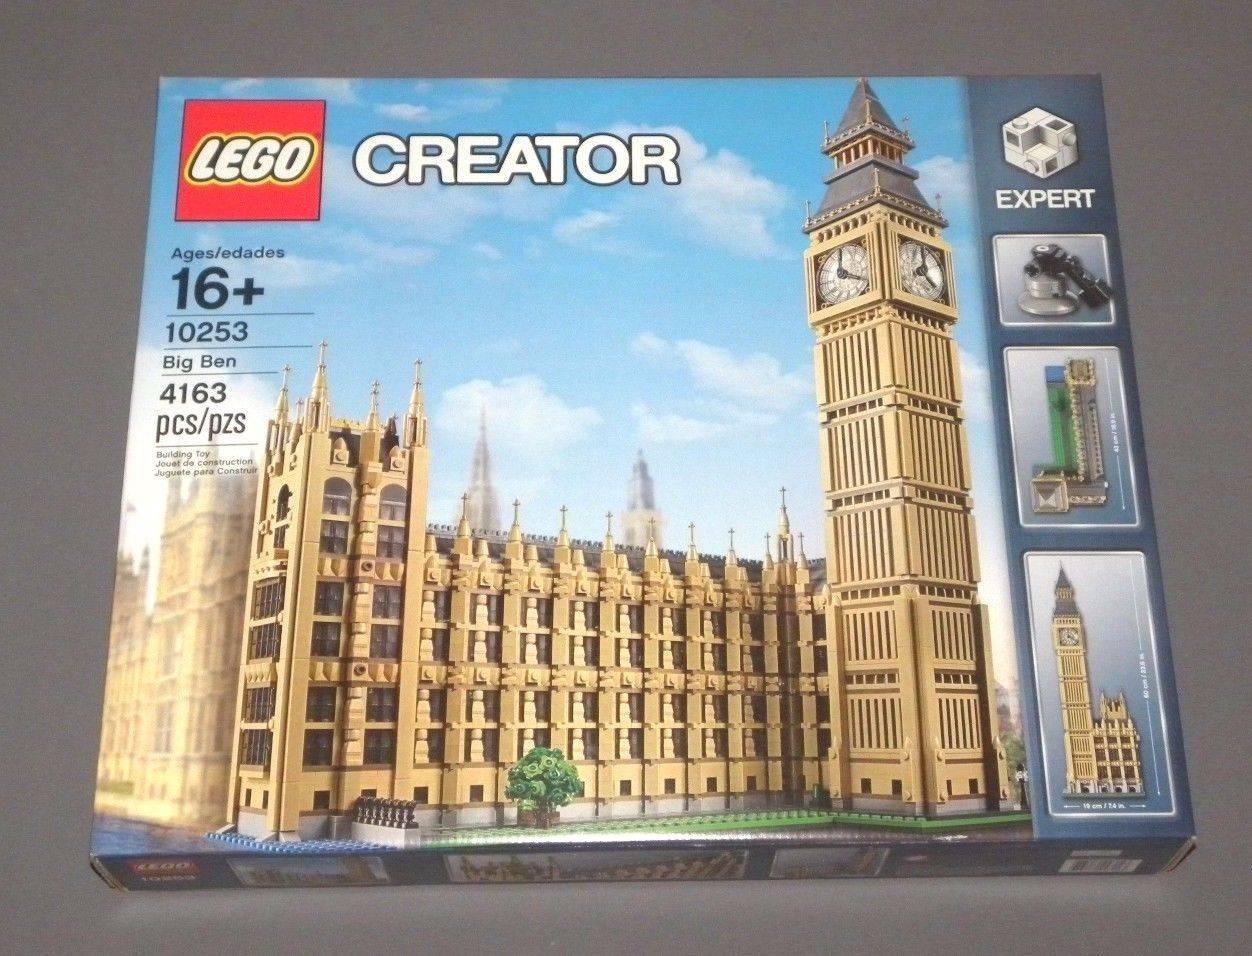 Lego 10253 Creator Big Ben Set